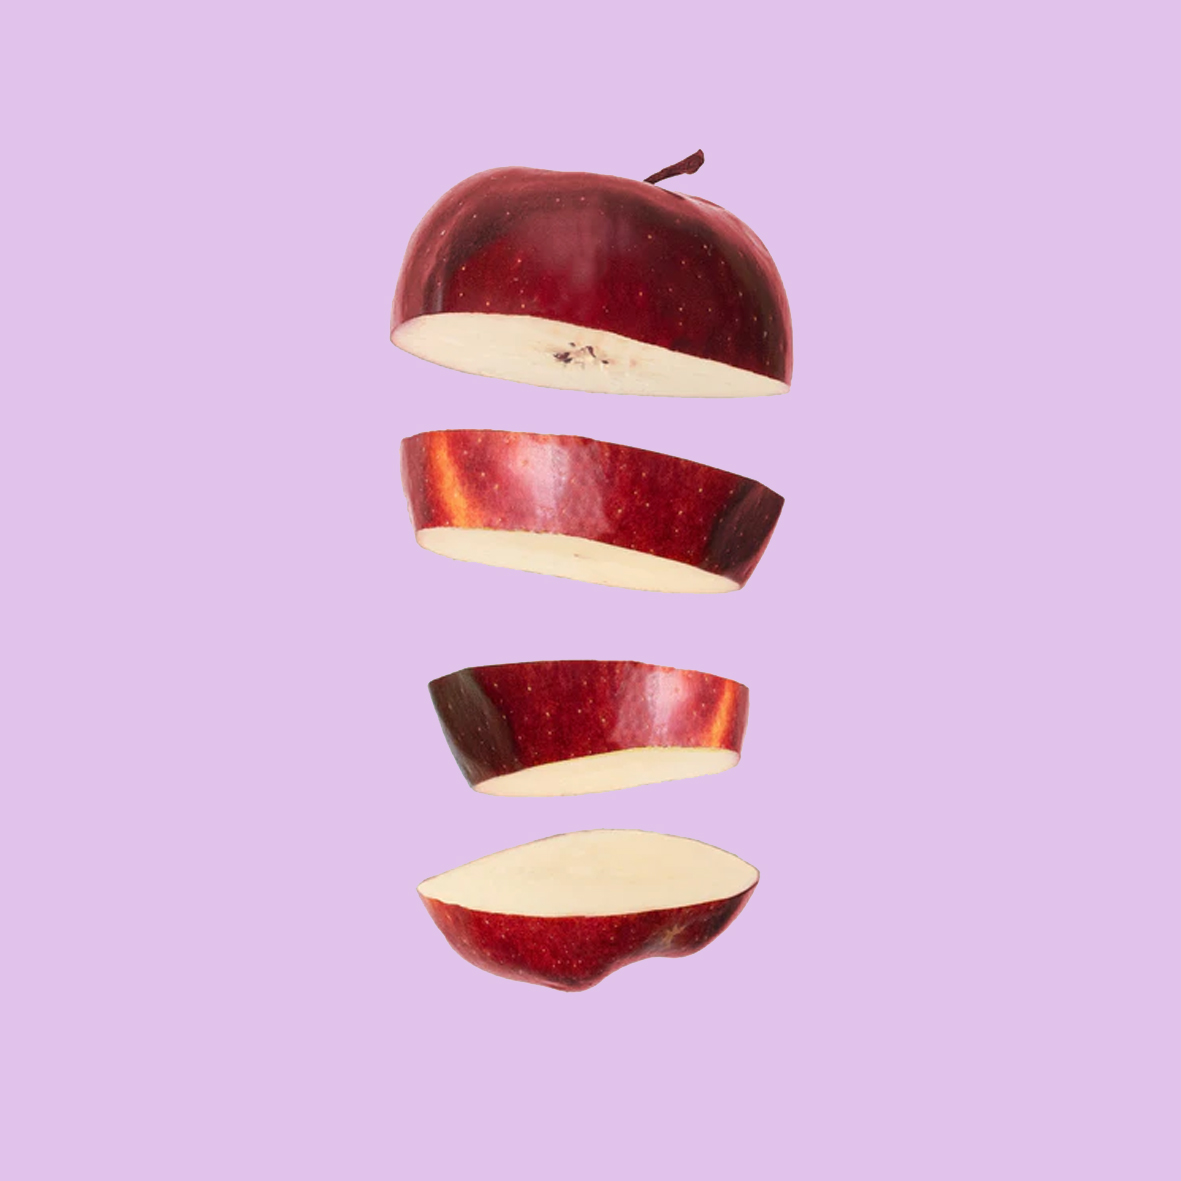 Apple - Top note